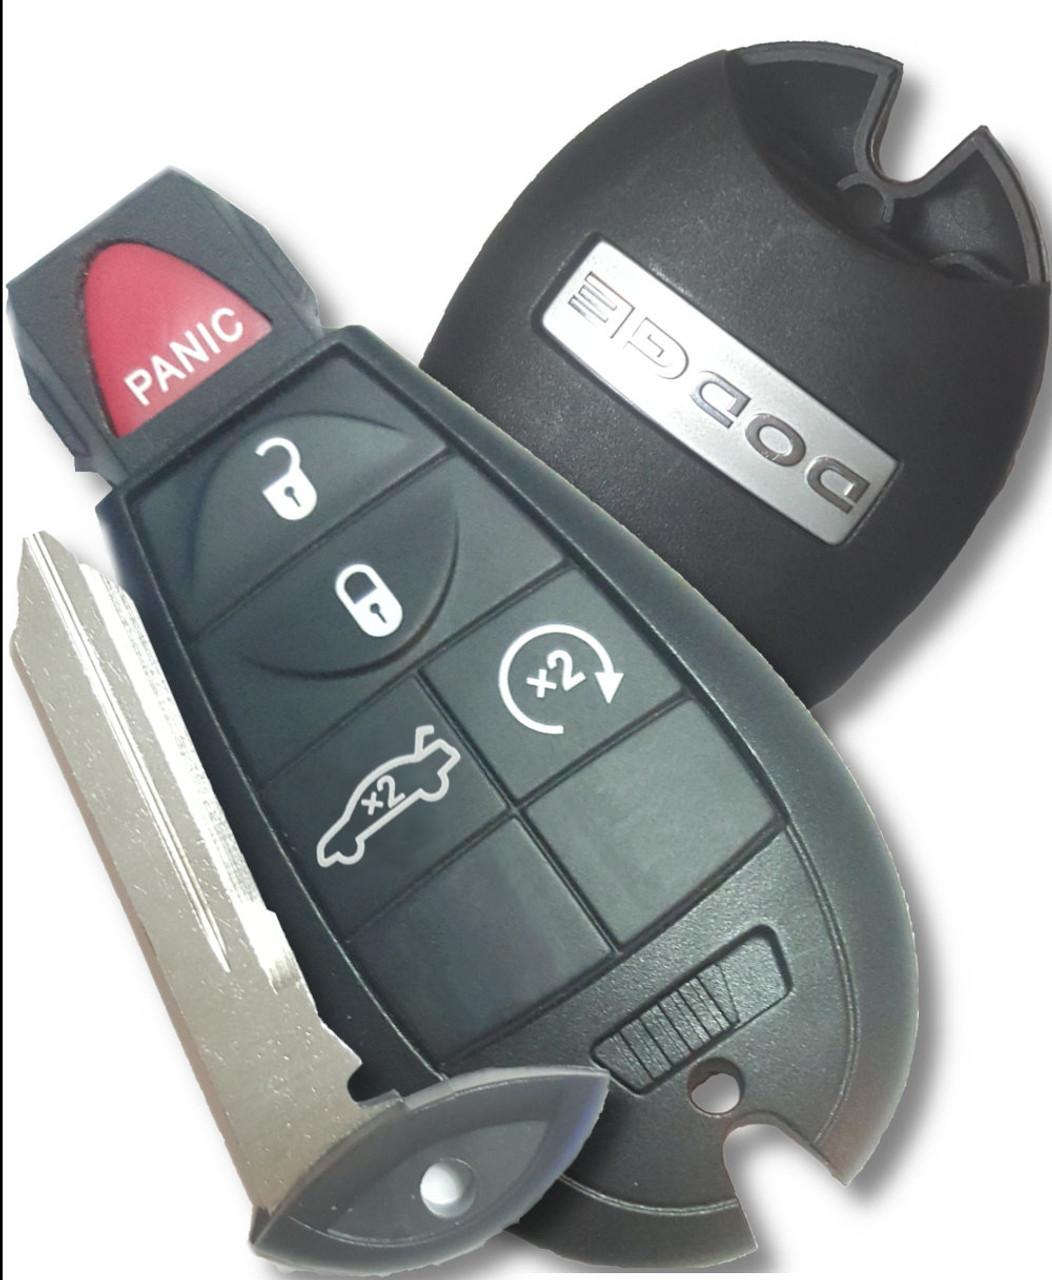 Dodge Challenger 05026887 , 05026457 , 56046694 IYZ-C01C 2701A-C01C Key - Fob / Remote